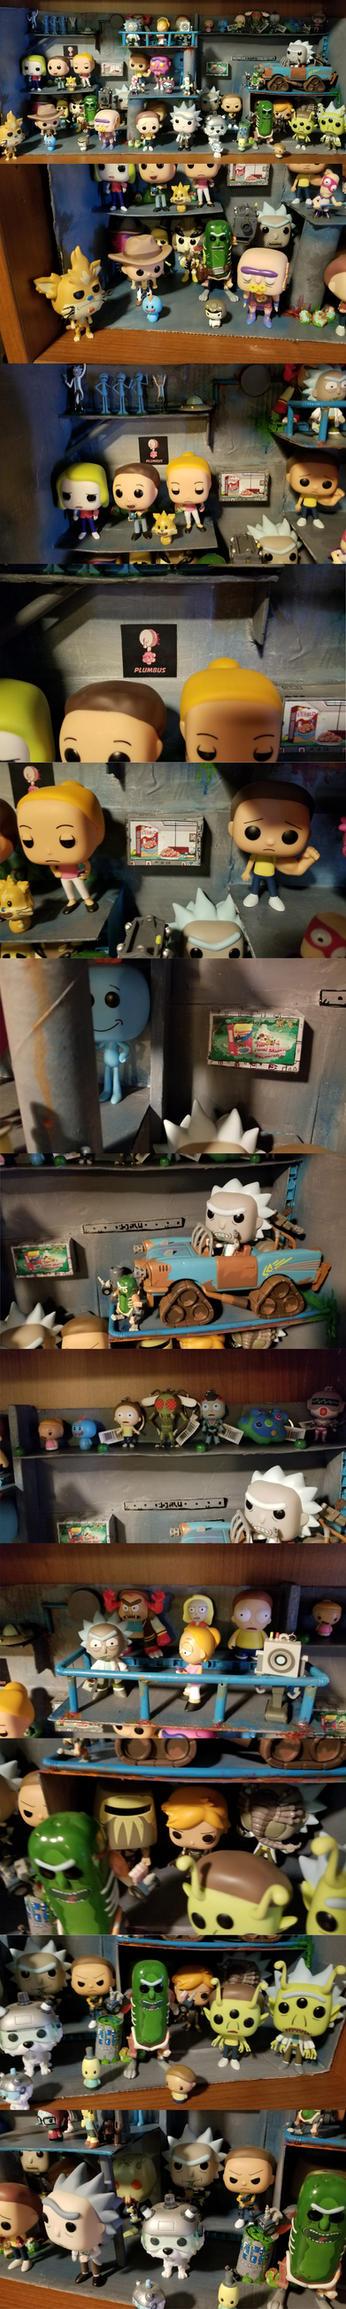 Rick and Morty Shelf Diorama by hawanja